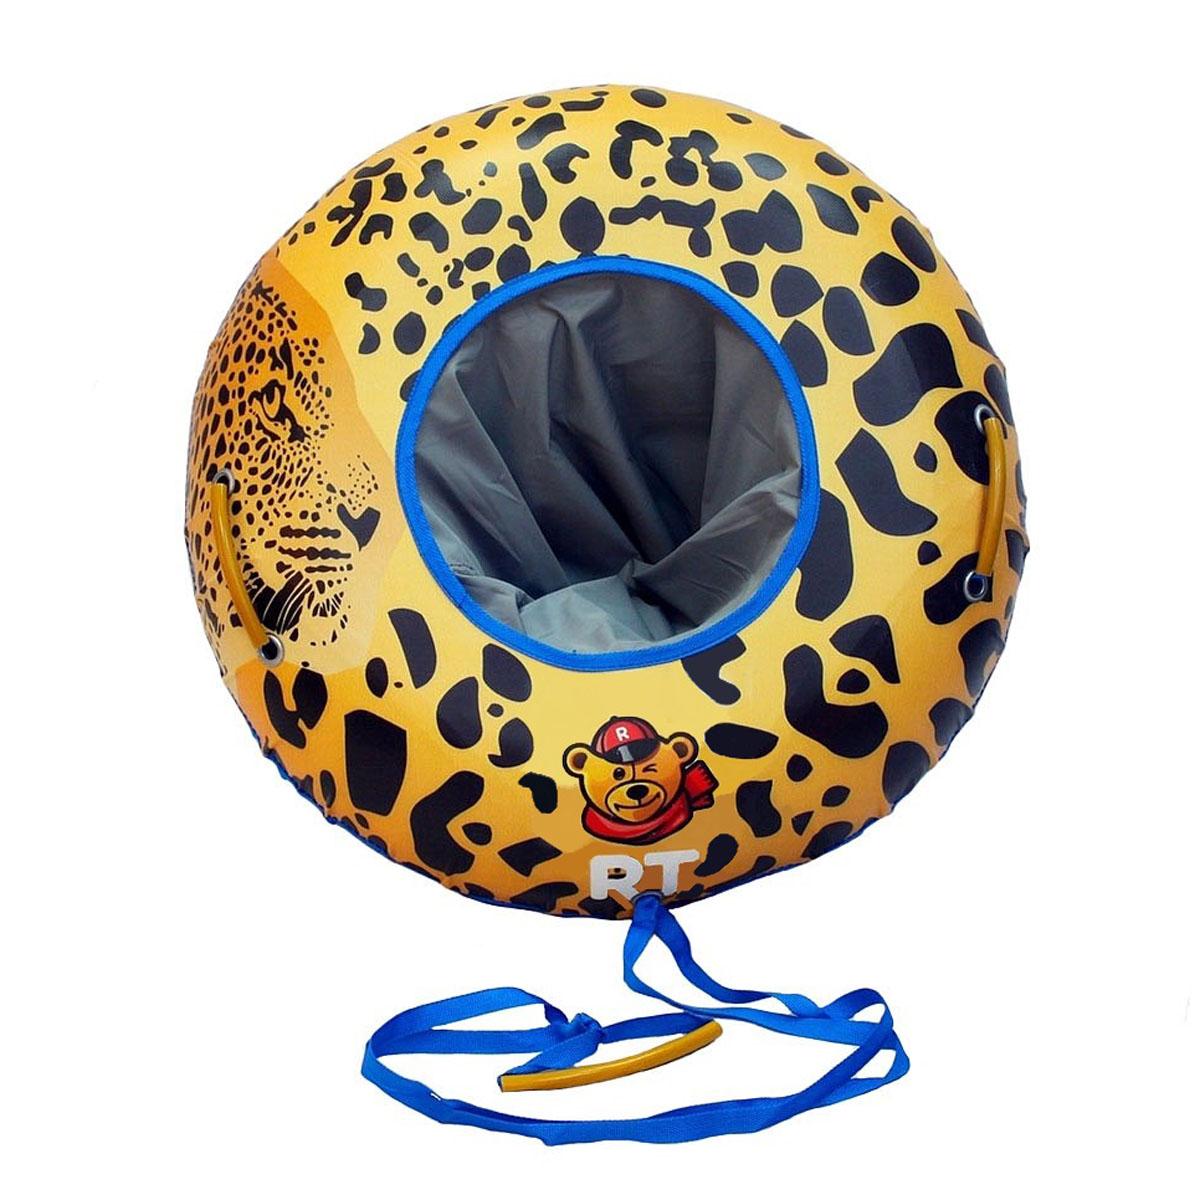 Тюбинг P-Toys № 13 Luxury Snow Элит Гепард диаметр 85 см